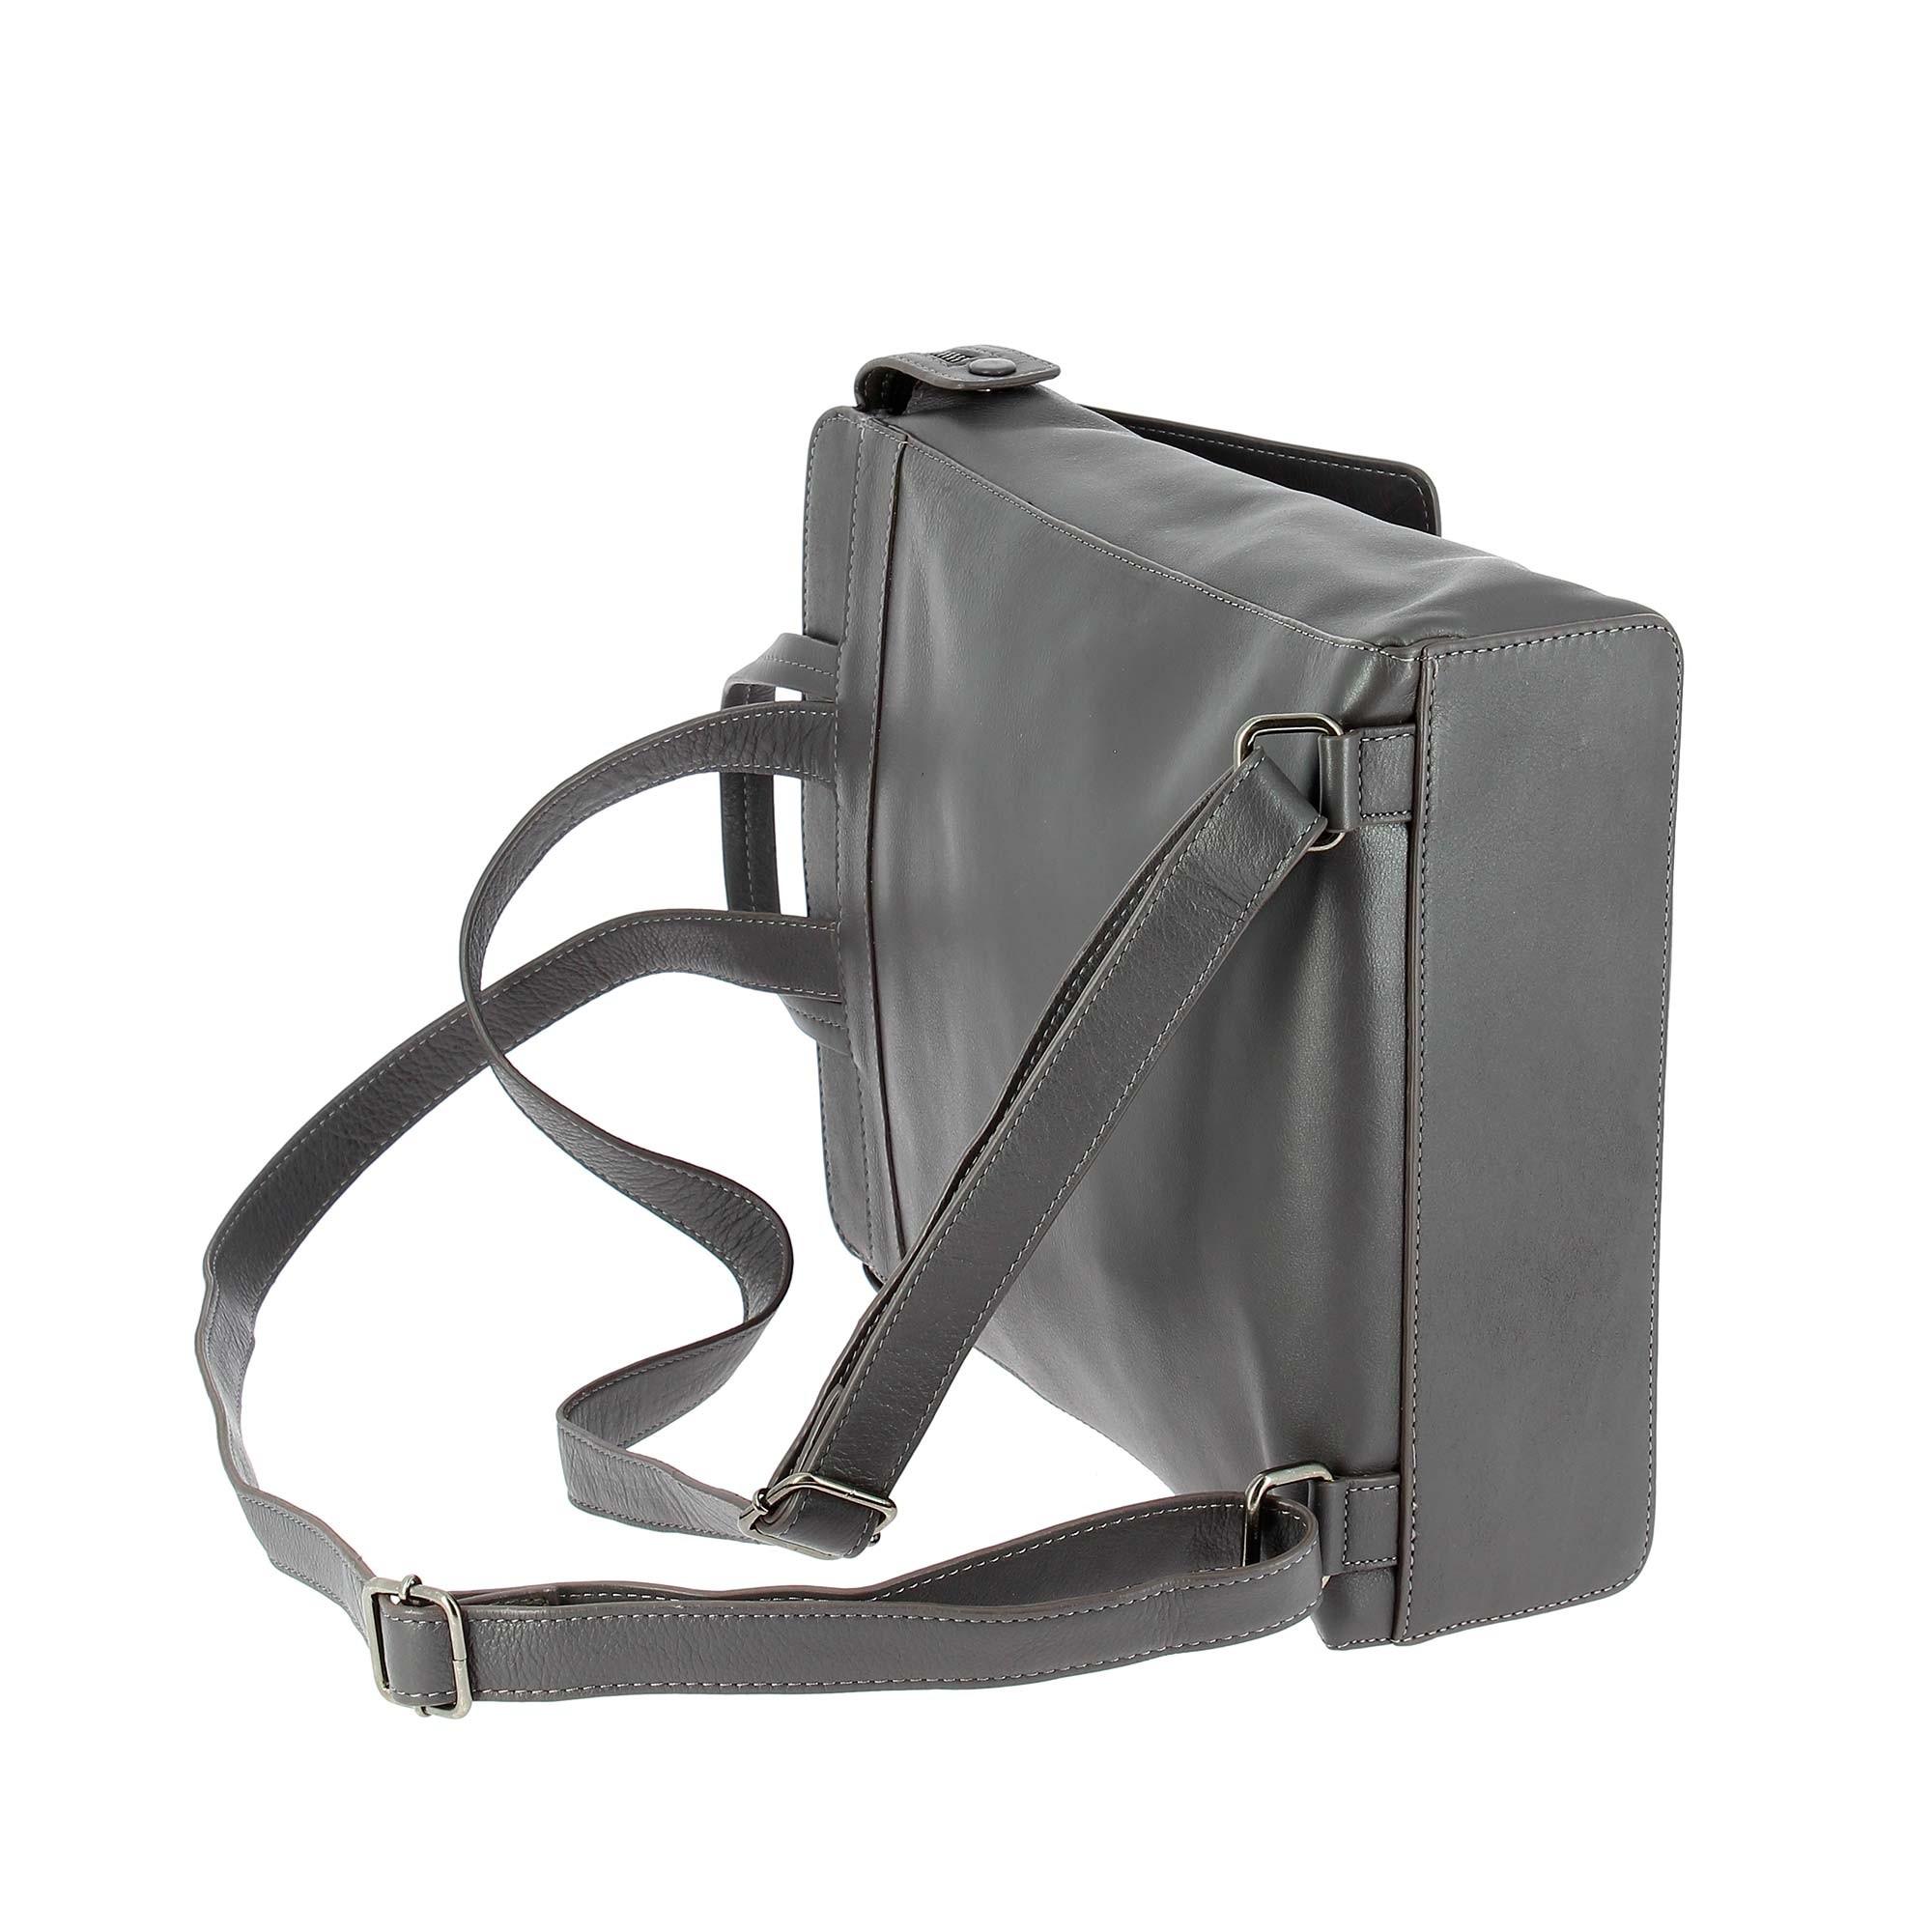 Dudubags Paris Collection Fashion leather backpack Marine 55612-1660 ... d90b11ac962d8